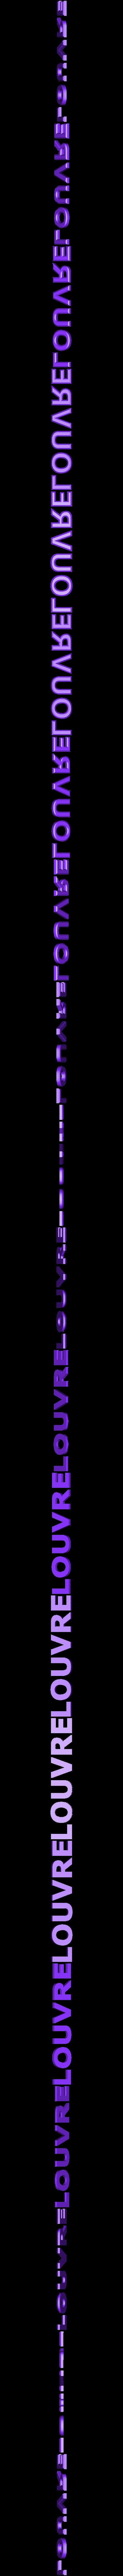 A014_111_Louvre_blanc.stl Download STL file Magnet station de métro • 3D print design, JJB